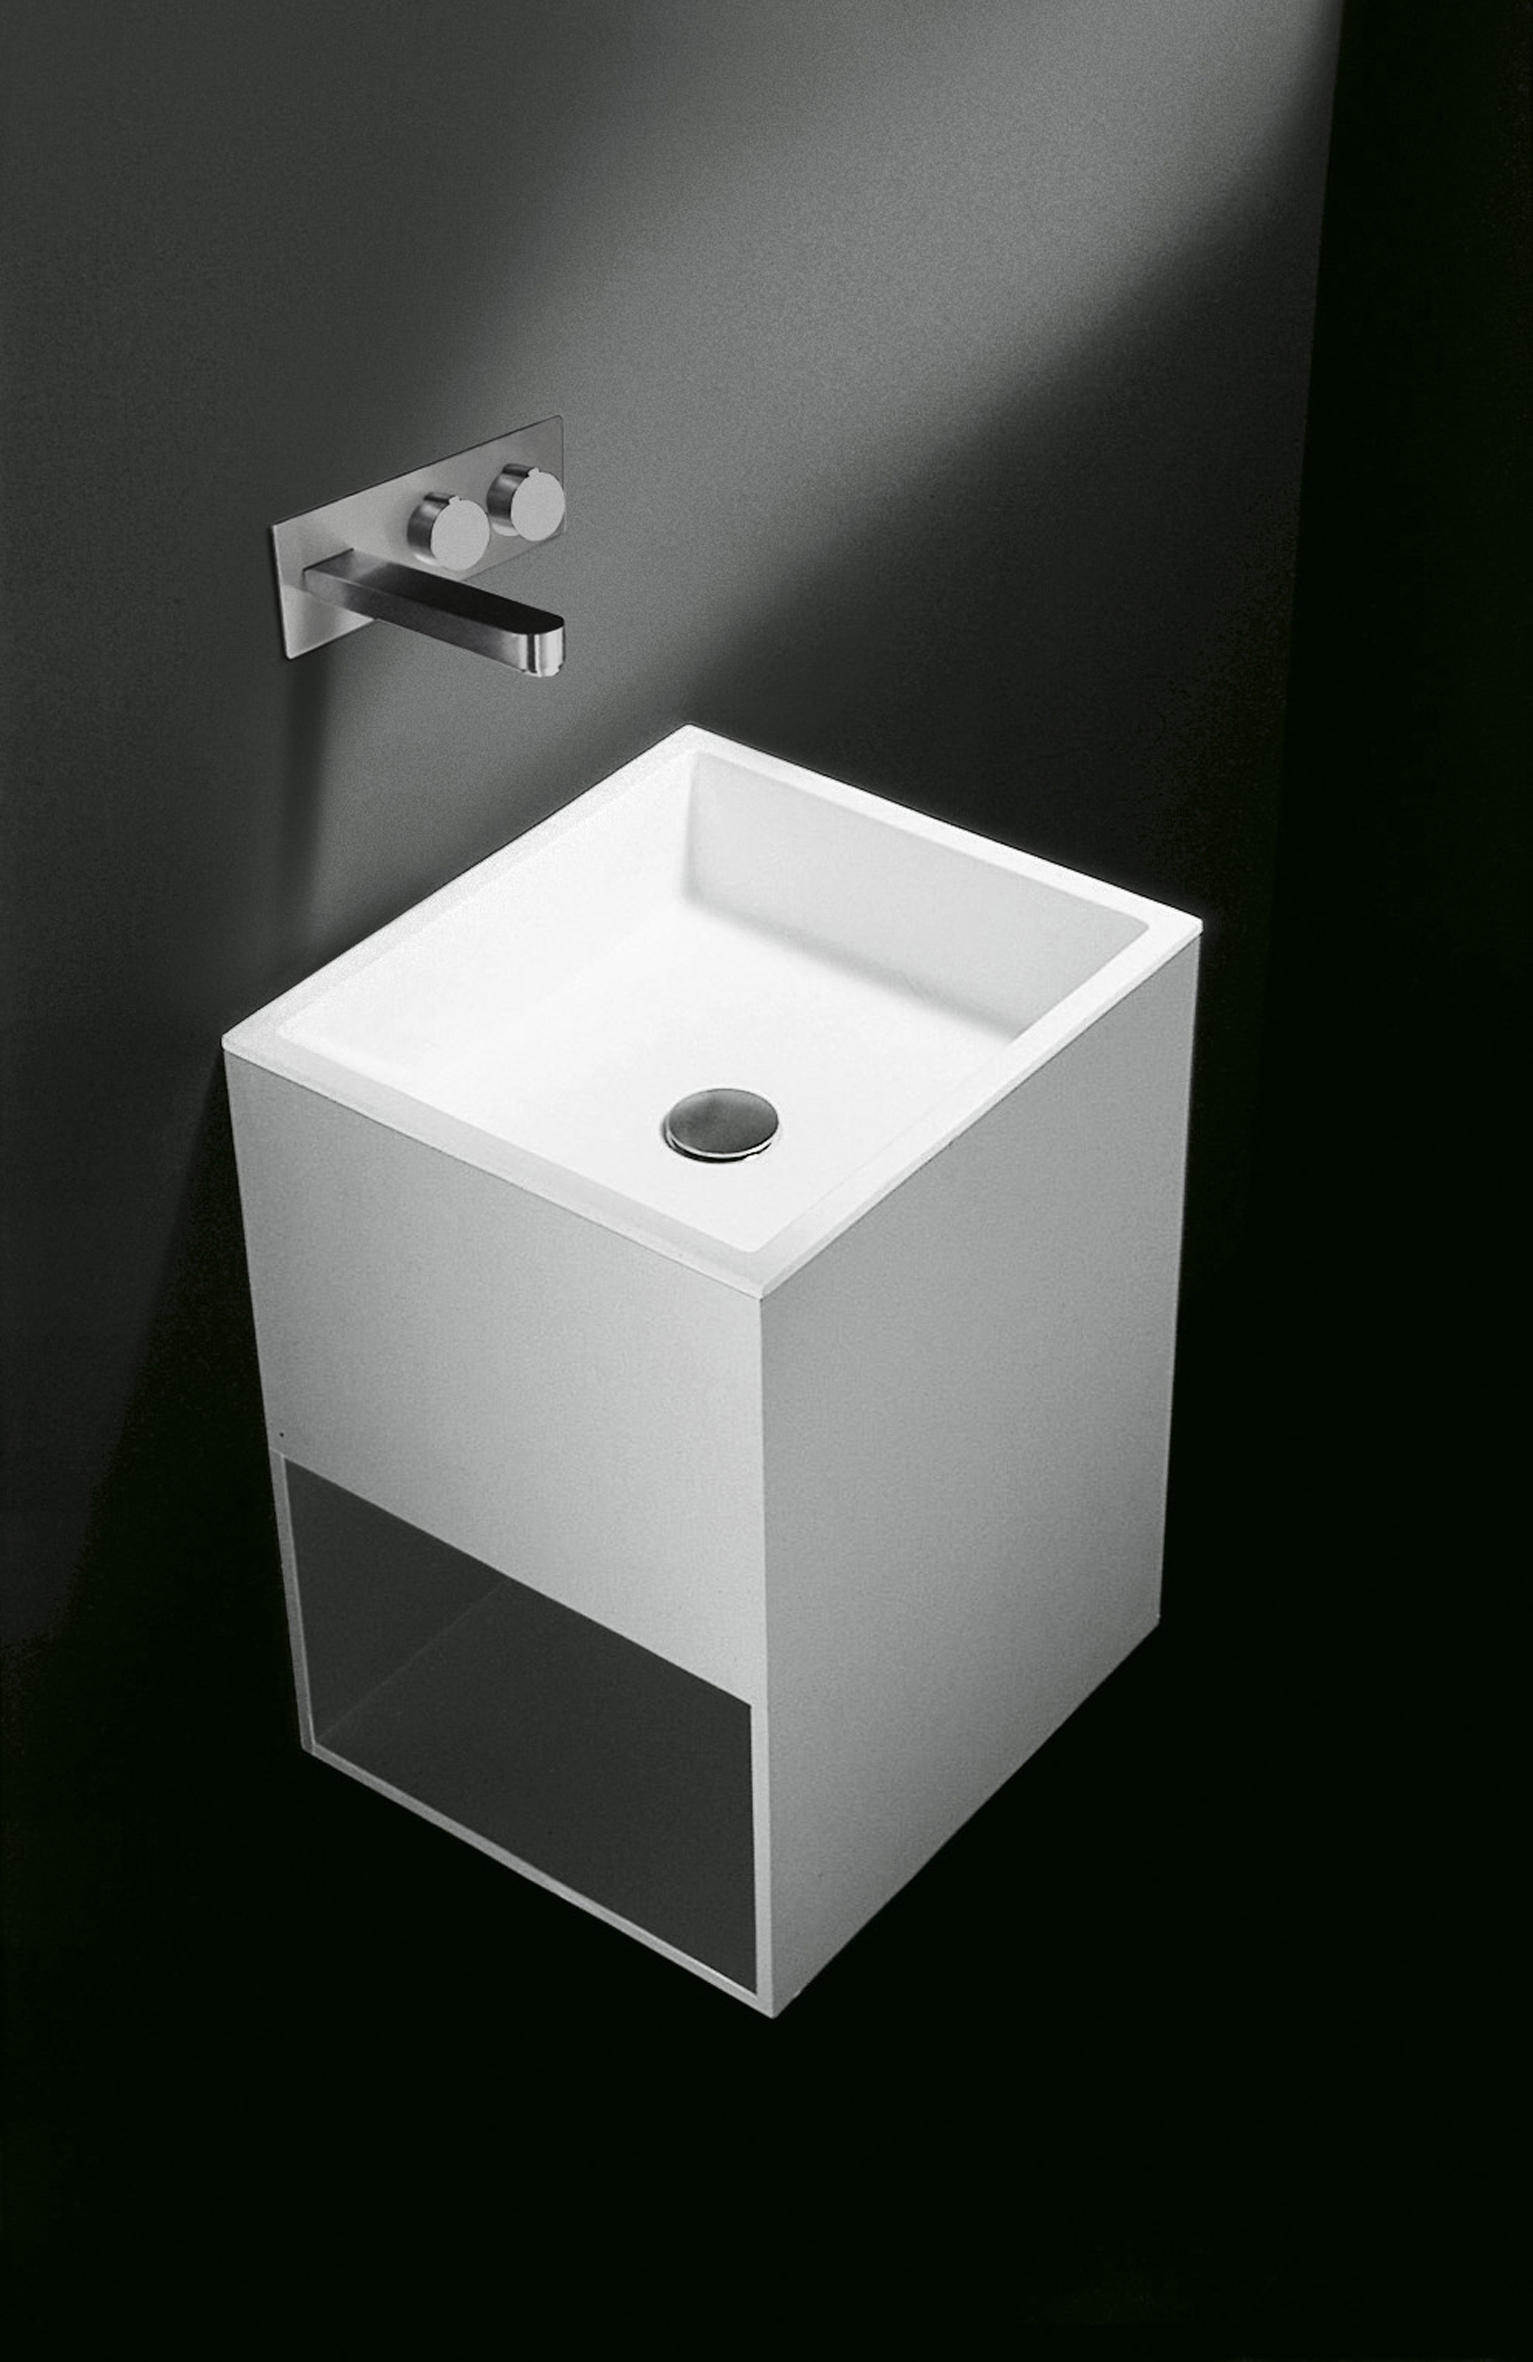 box wash basins from boffi architonicbox by boffi wash basins